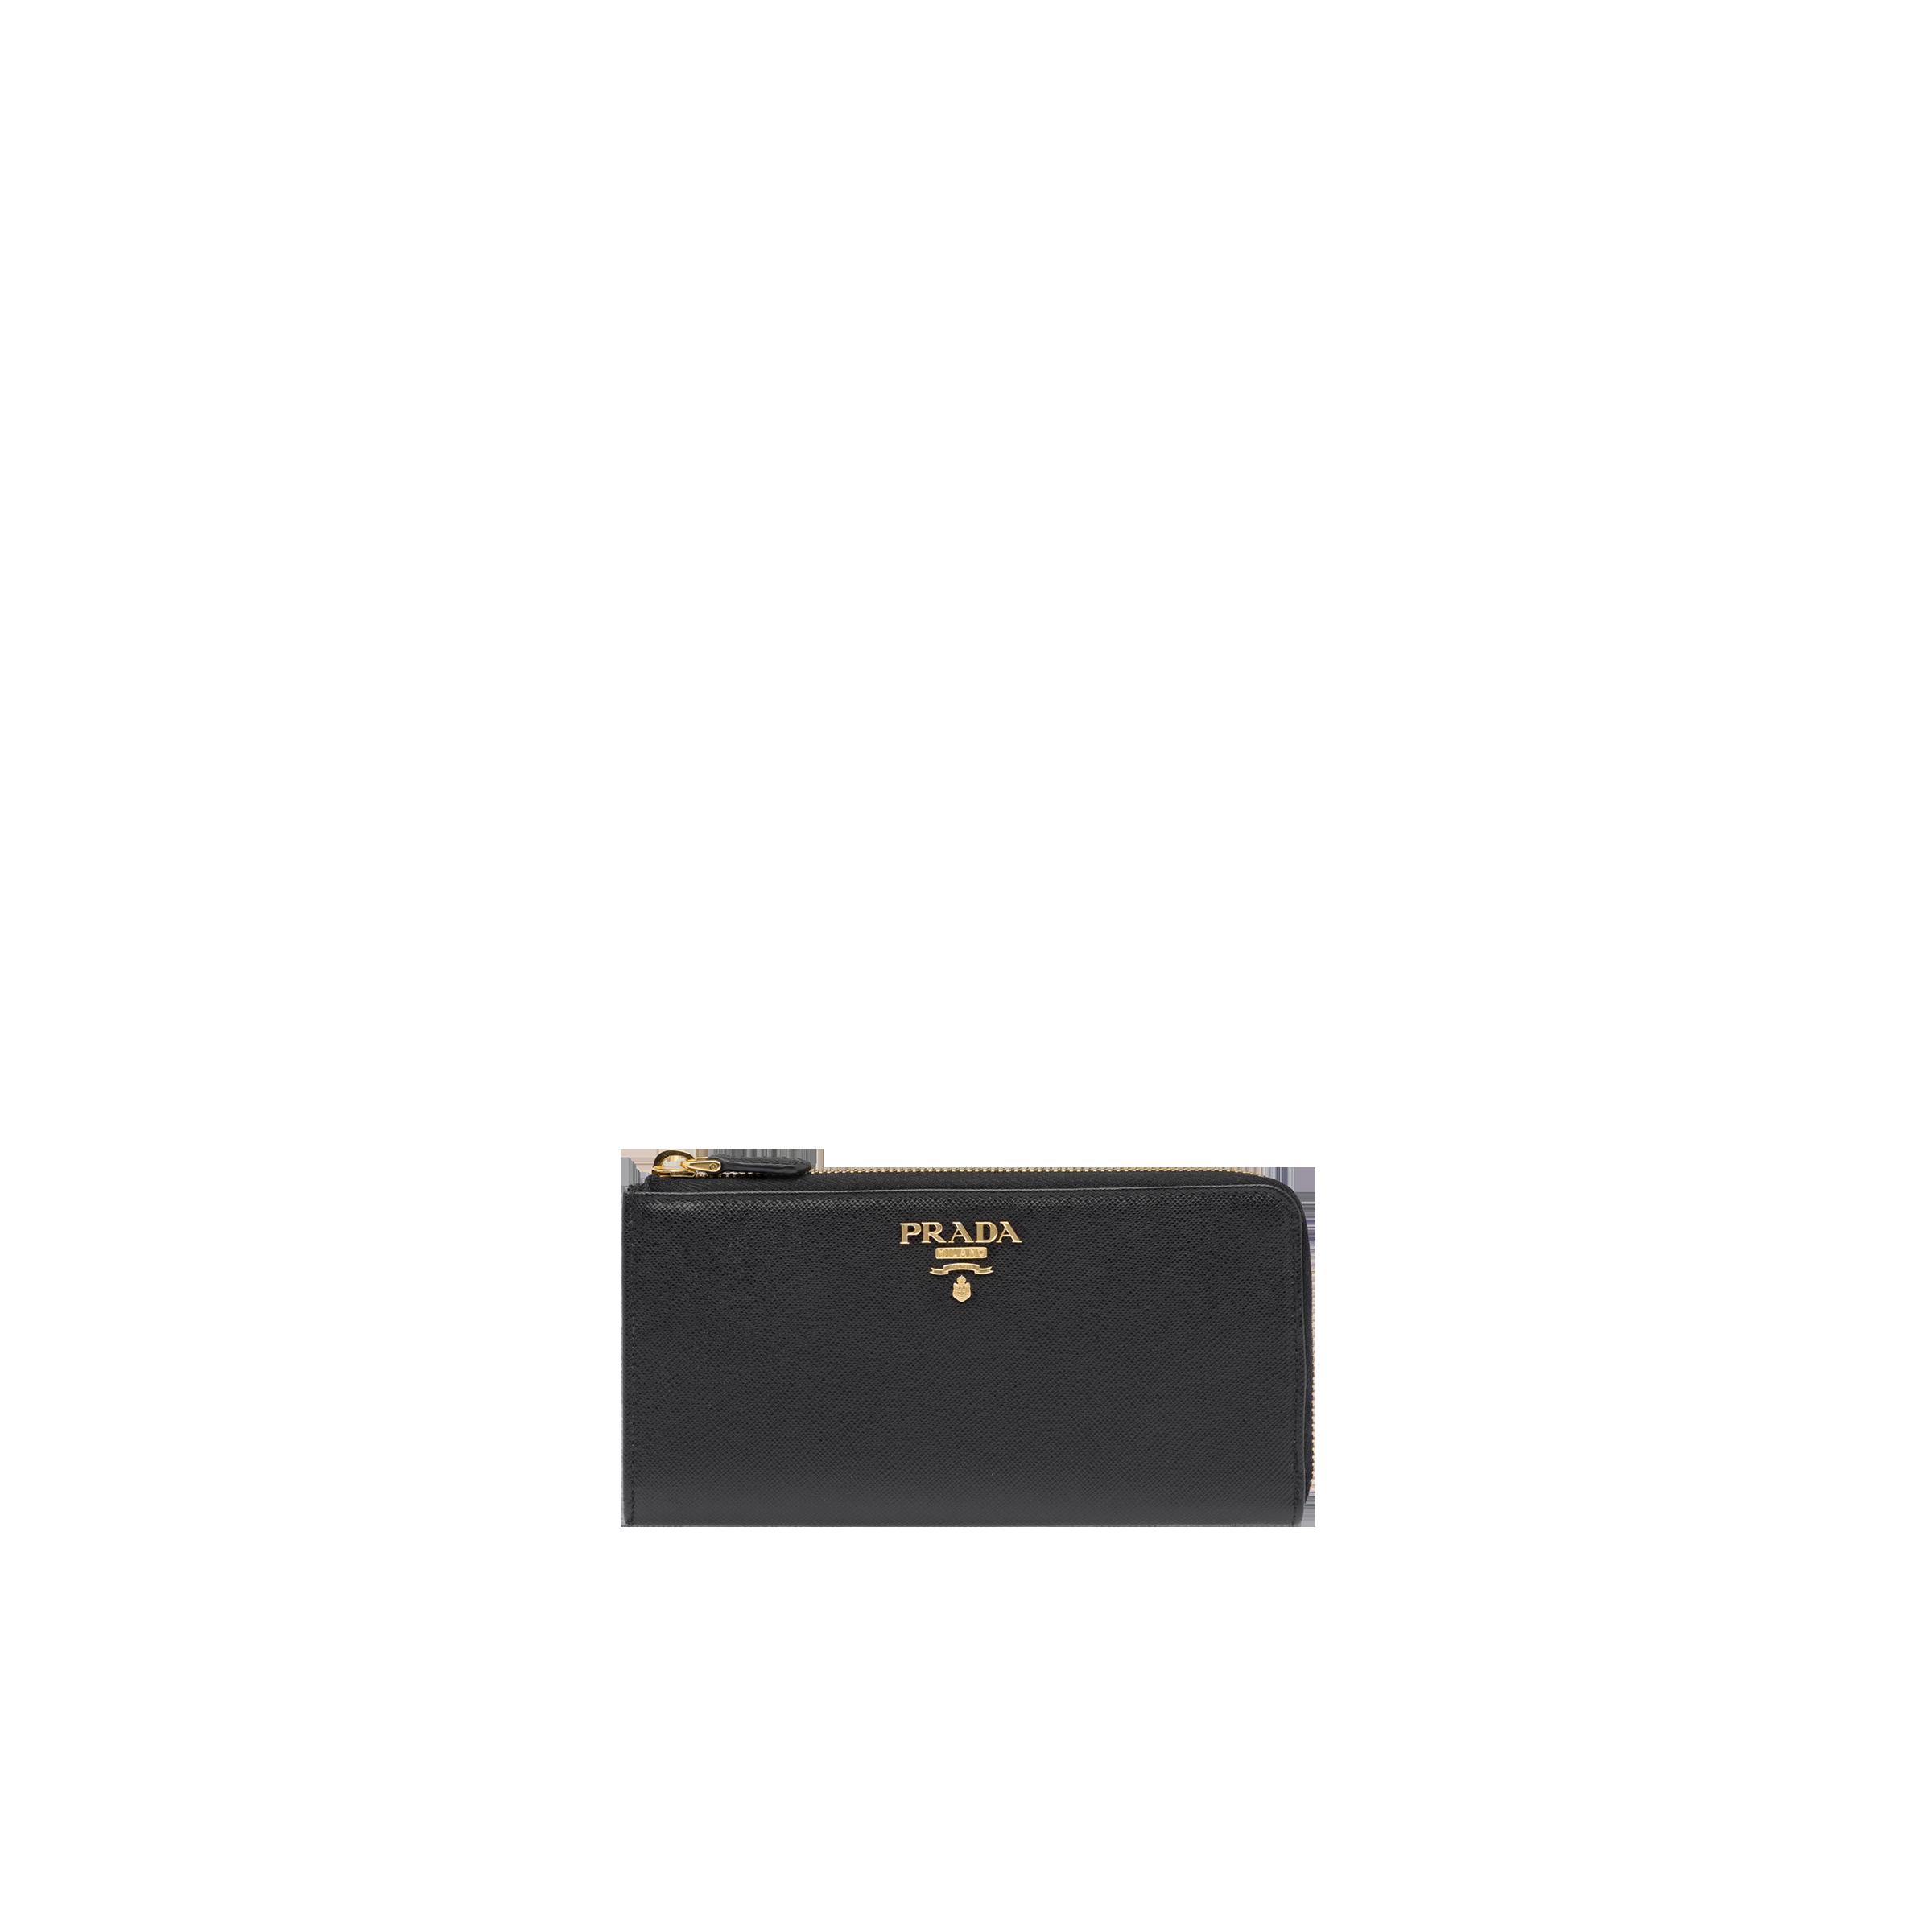 4cf74eca4bc9 Women's Wallets | Prada